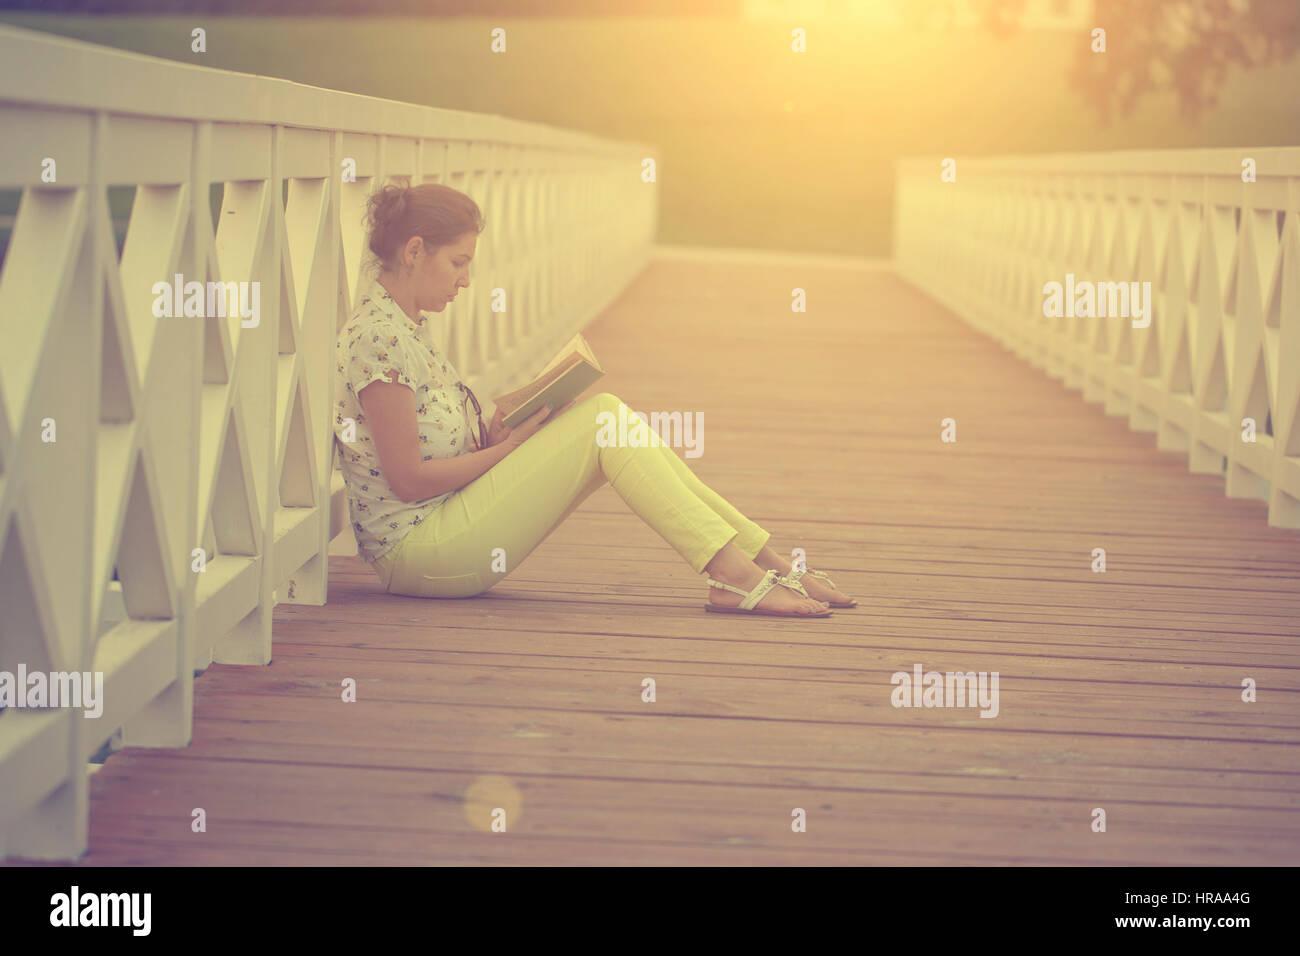 Mujer / lectura de aprendizaje concepto en Sunset Imagen De Stock